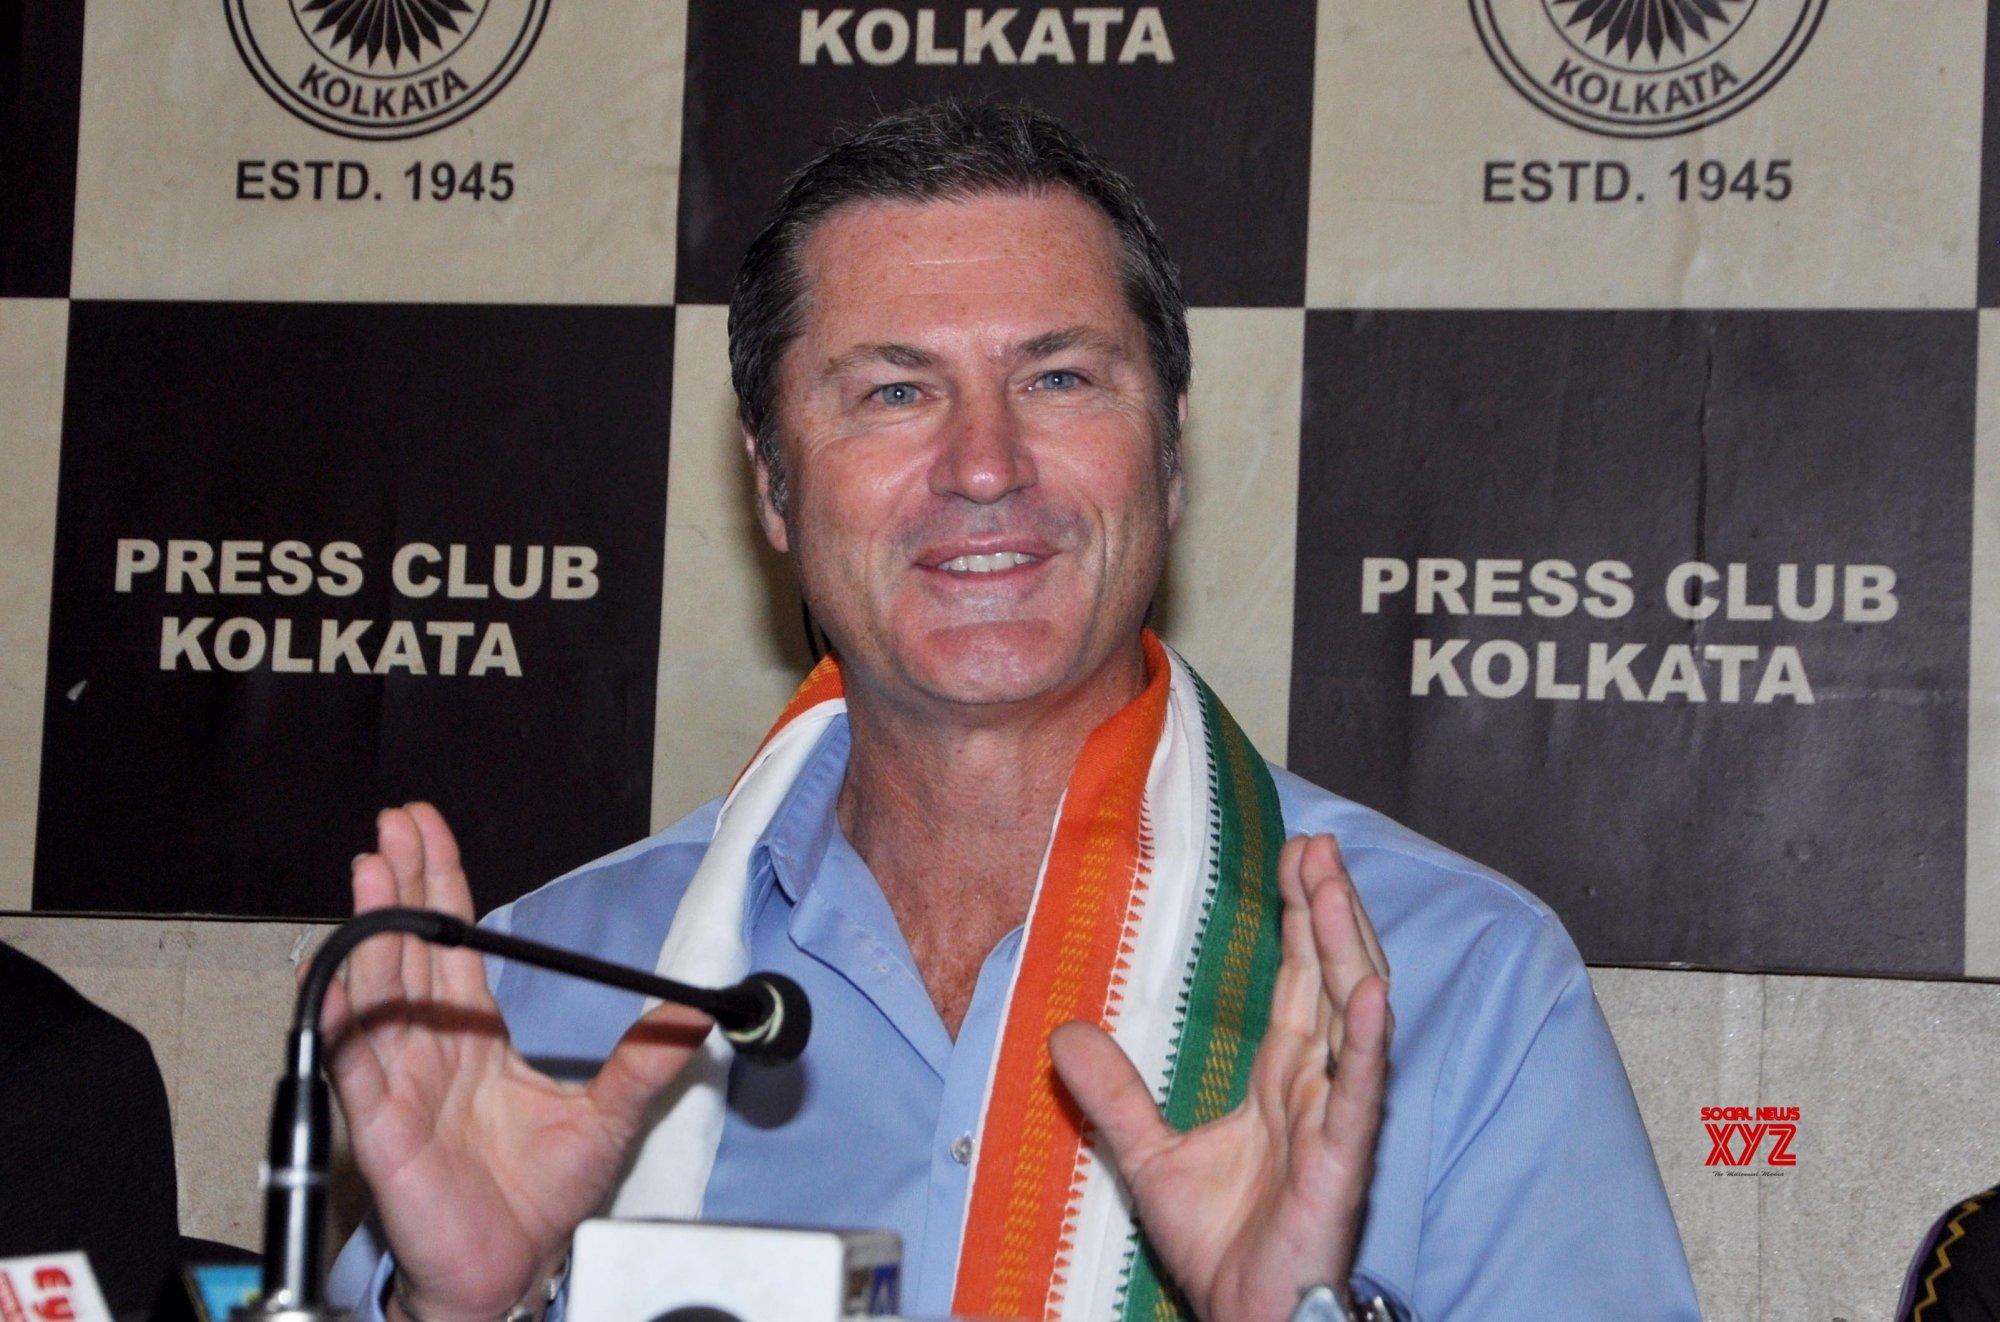 Umpire Taufel backs Hardik, Rahul